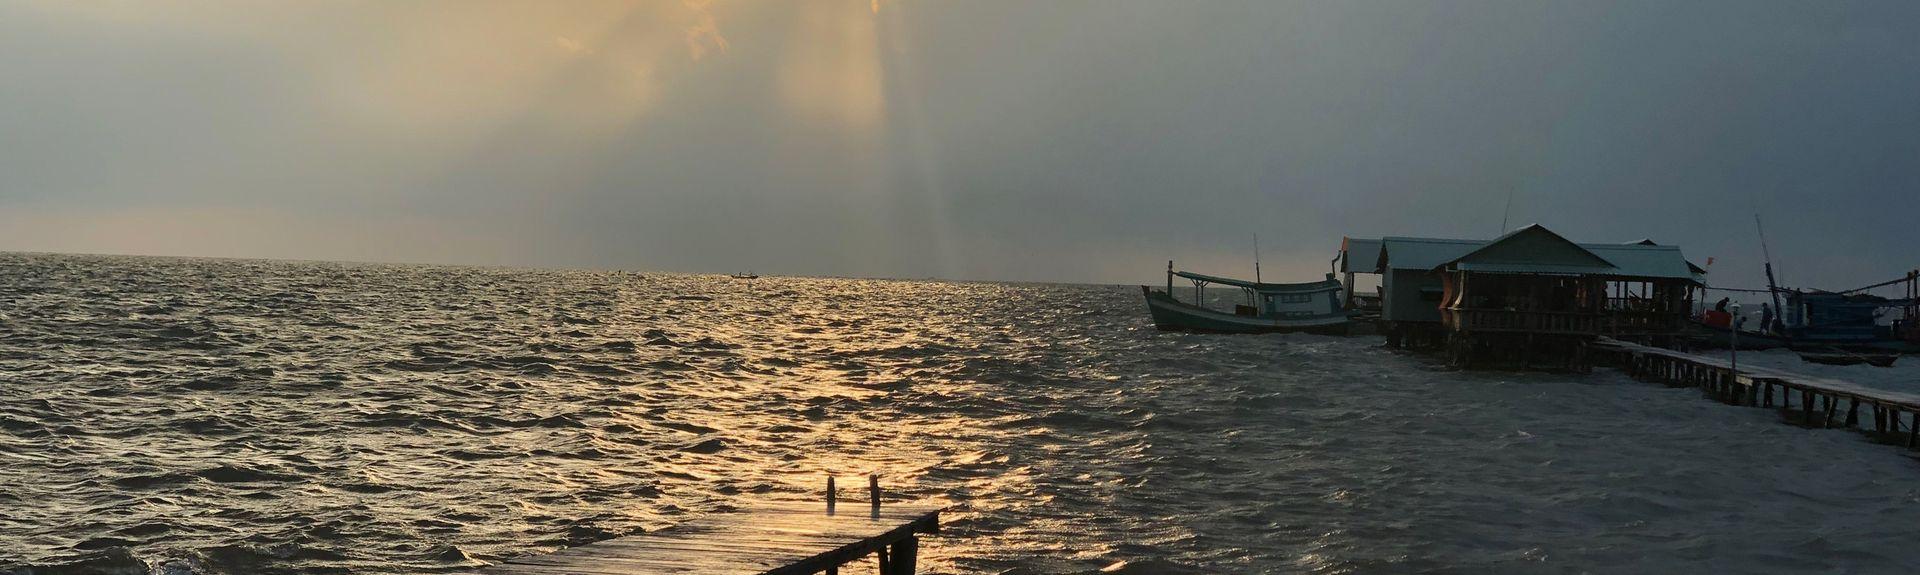 Phu Quoc, Kien Giang (province), Vietnam